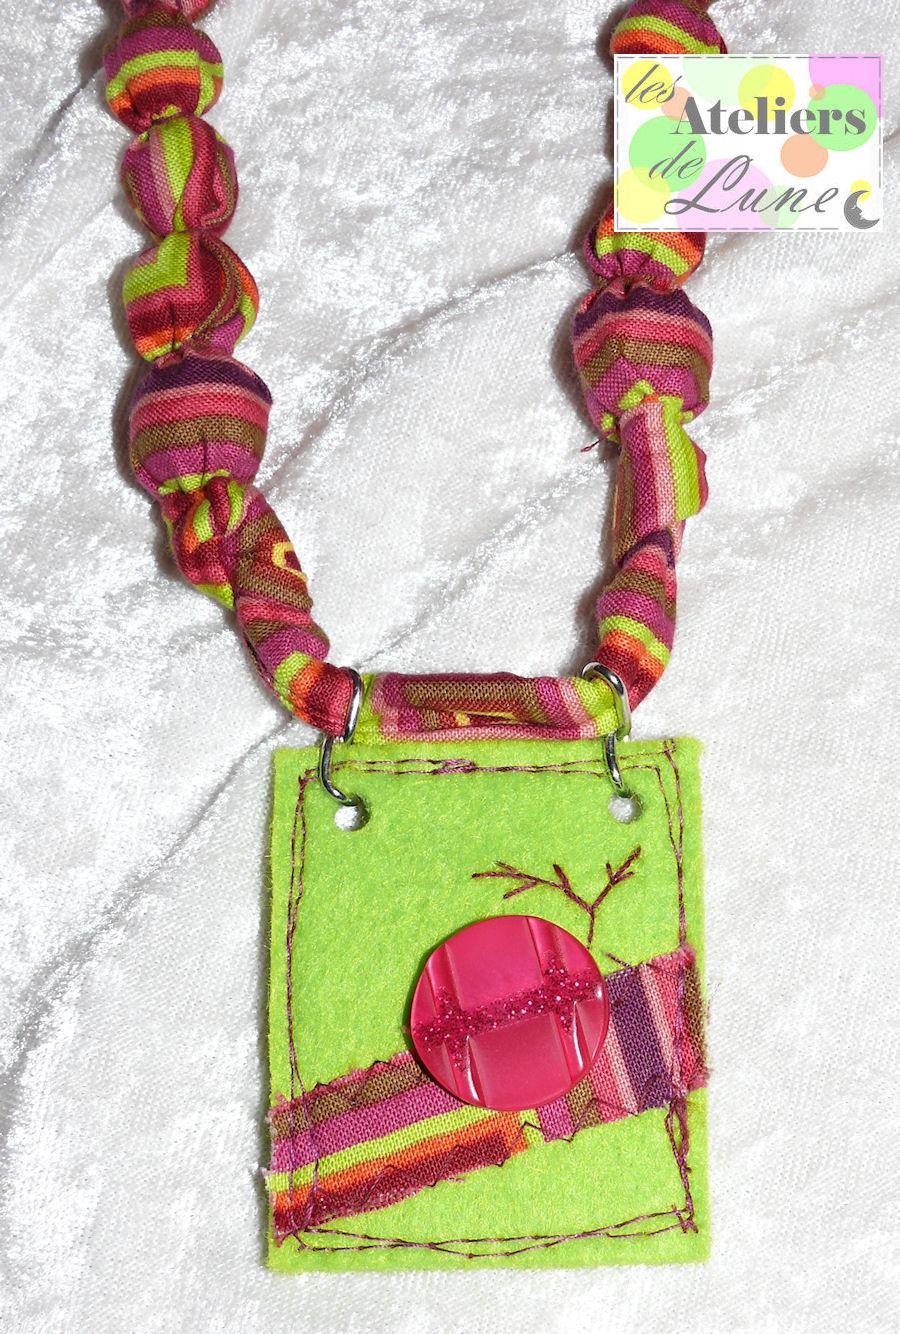 http://scrap.en.folie.free.fr/apourblog/bijoux/2010/perle_tissu/vert/collier/2%20rectanglevertpomme/Image4.jpg